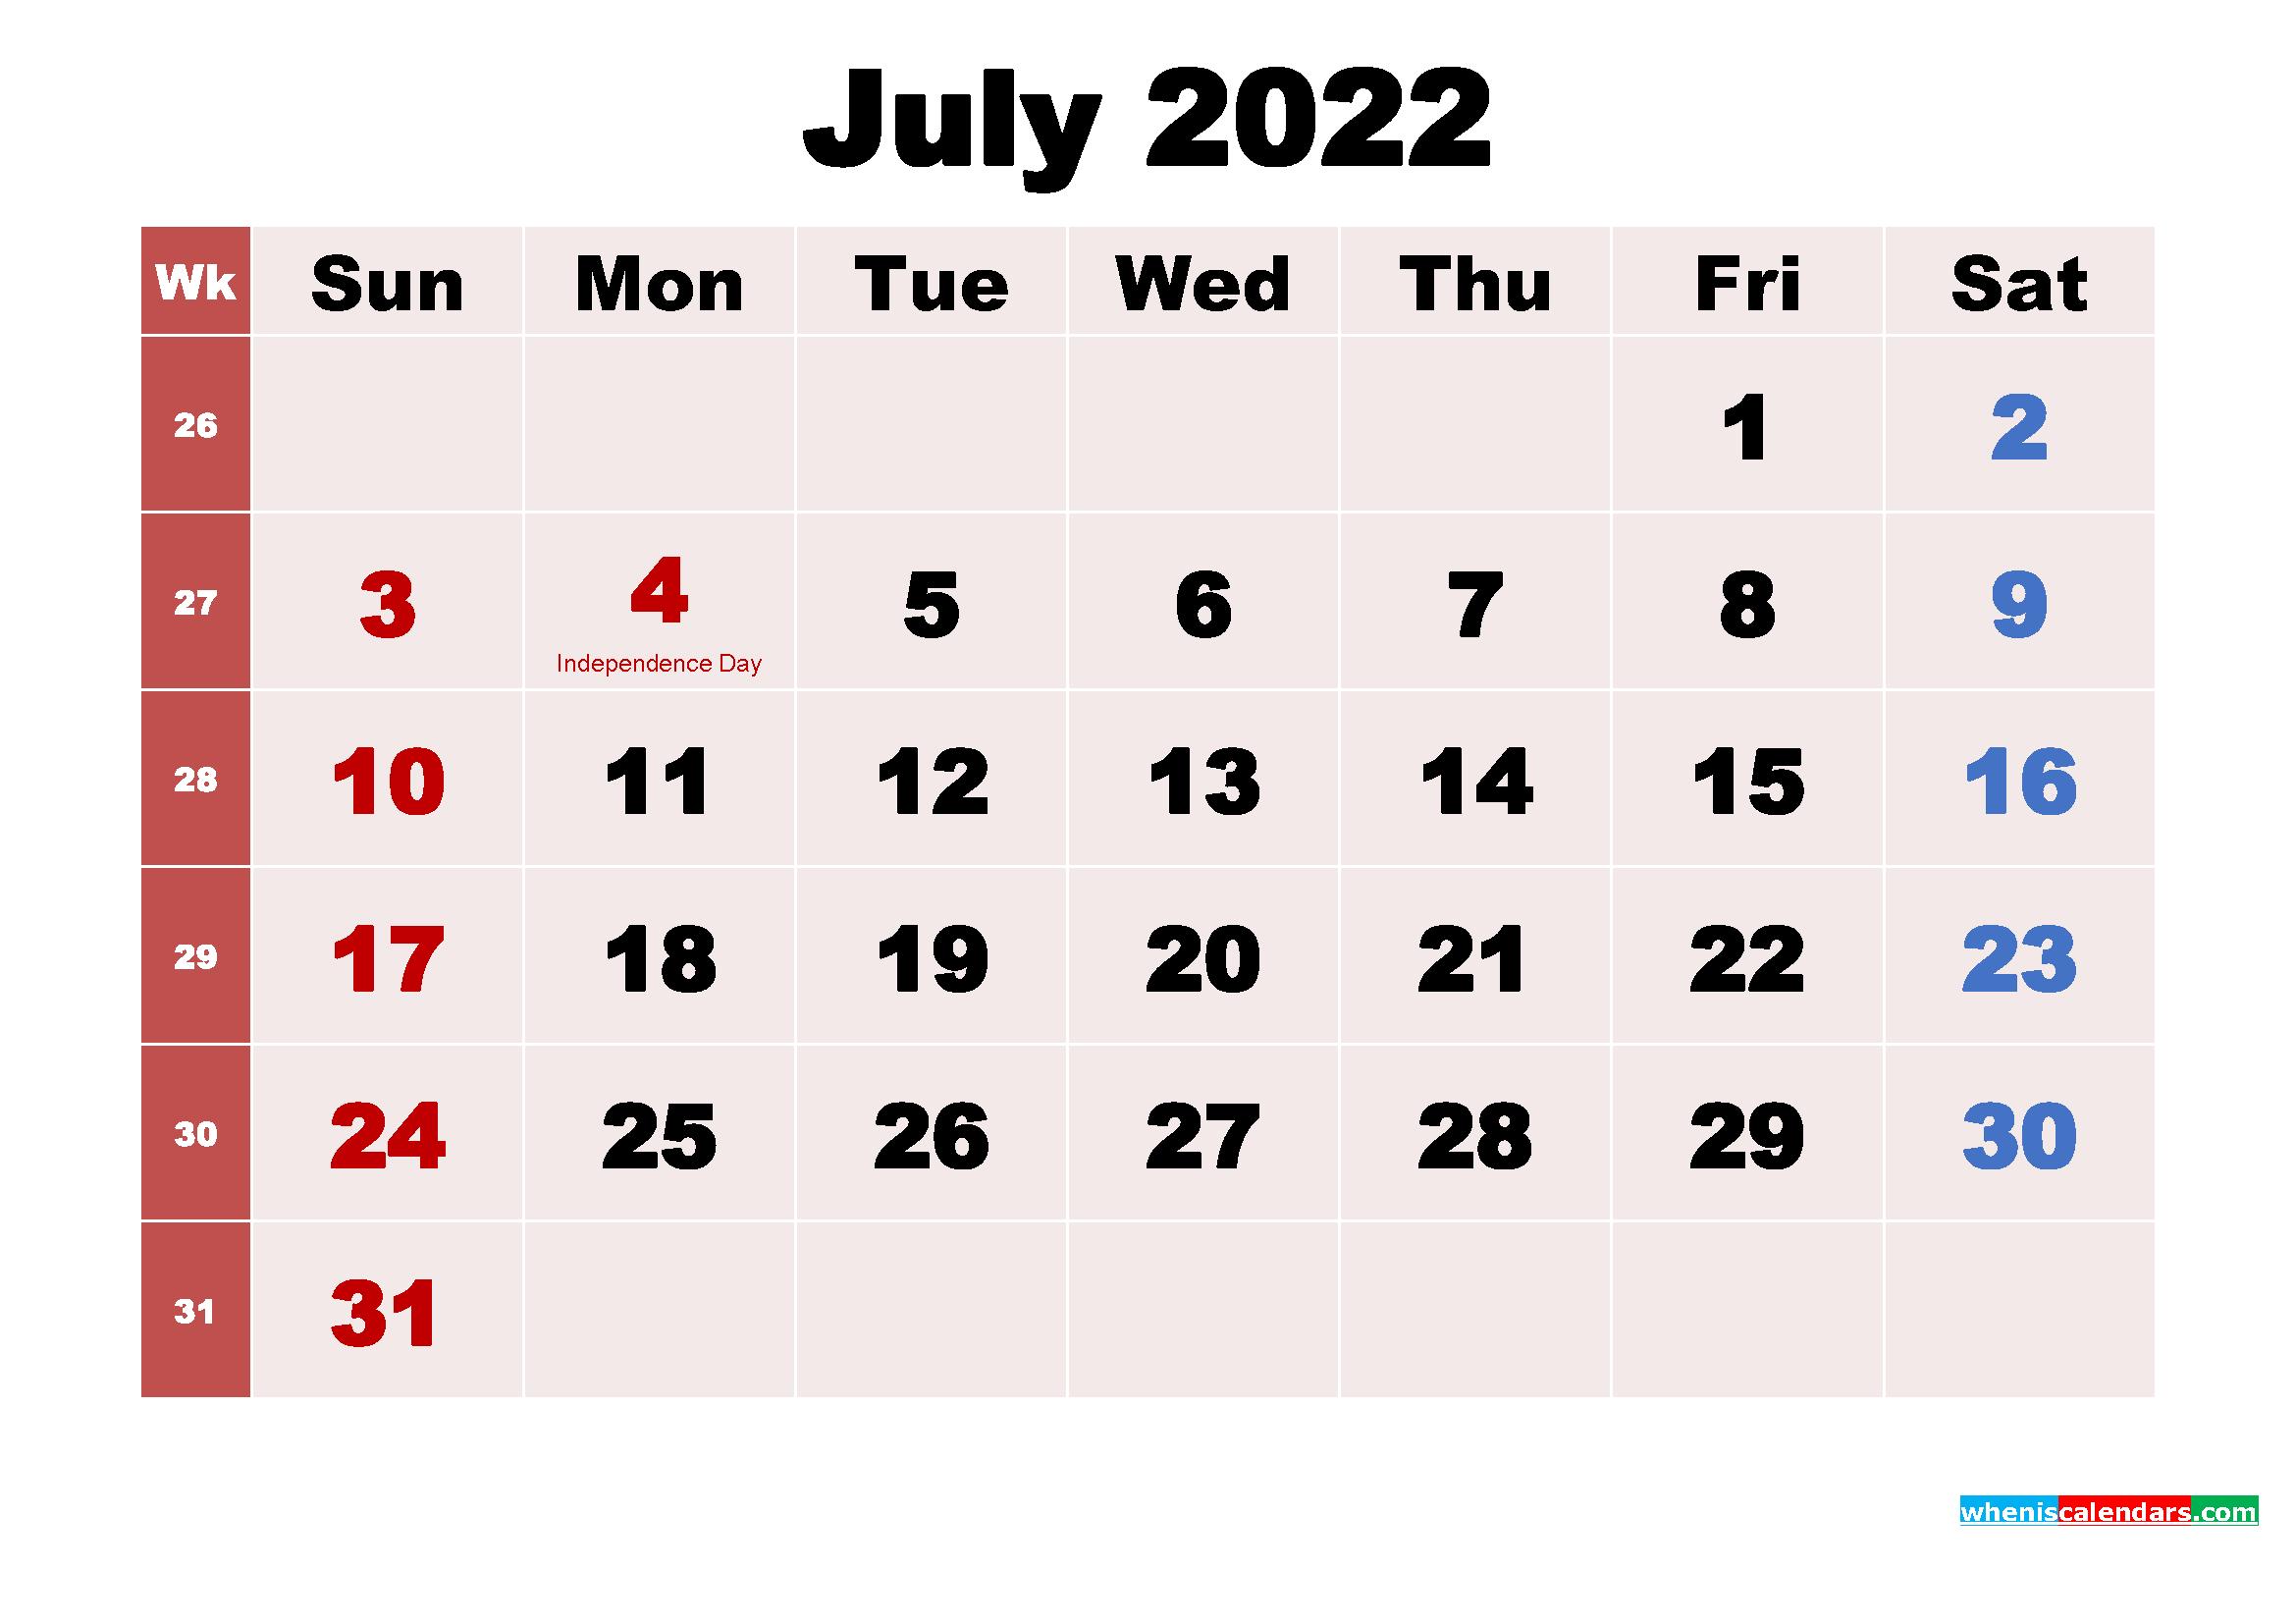 July 2022 Calendar Wallpaper Free Download